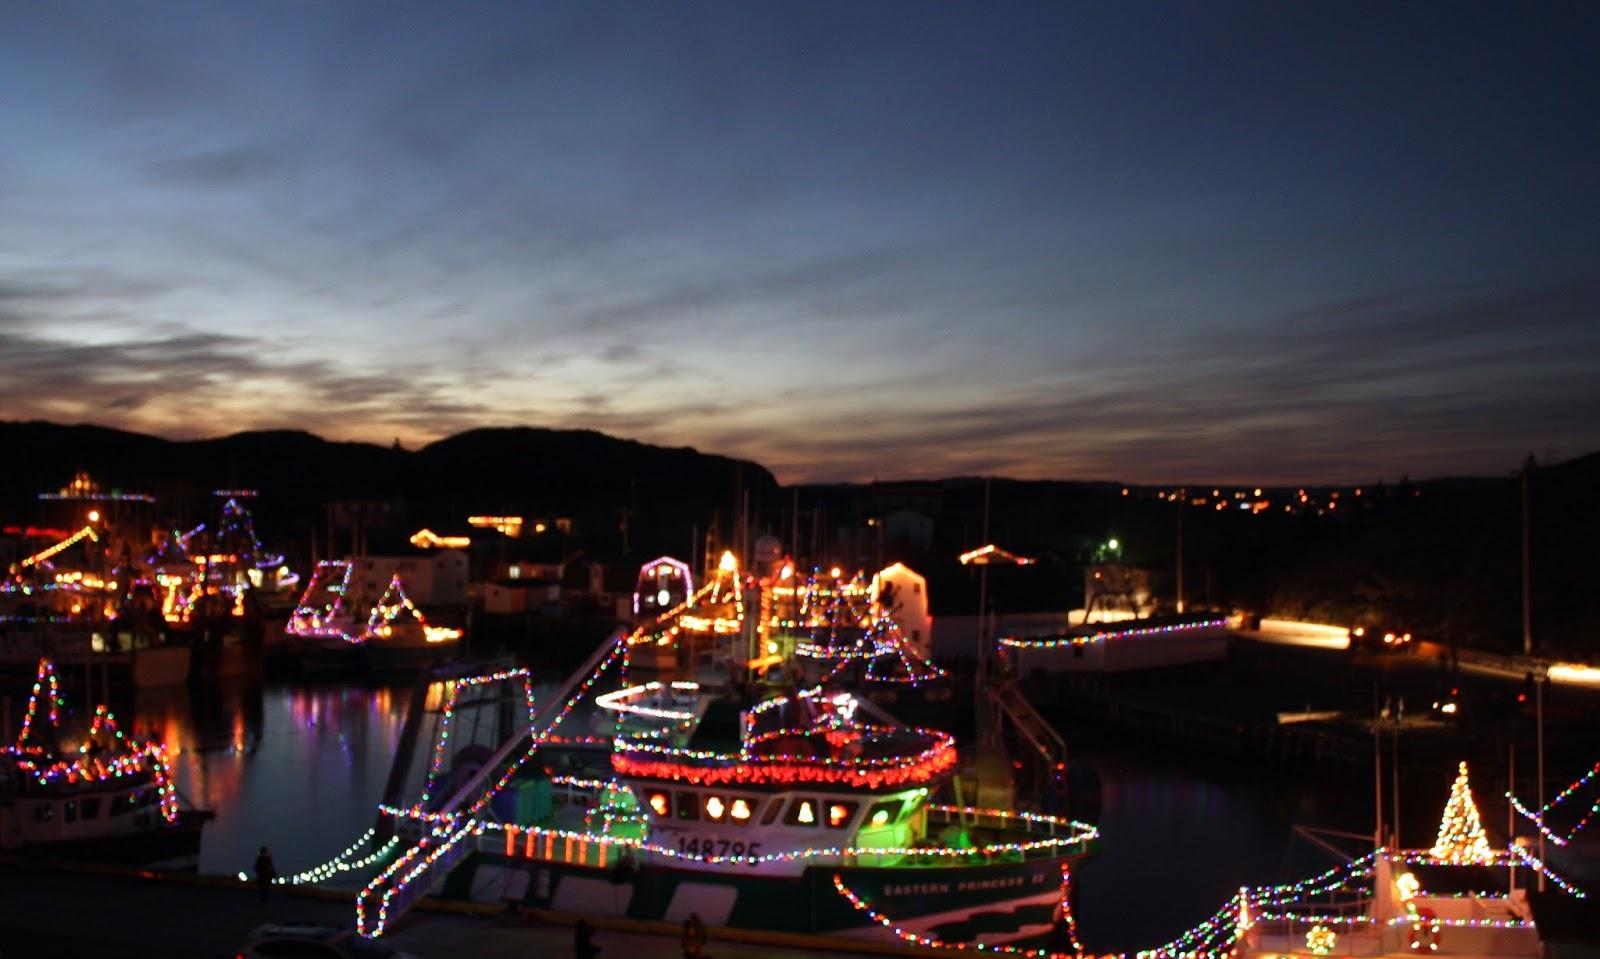 My Dark Cove Pantry Port De Grave Annual Boat Lighting